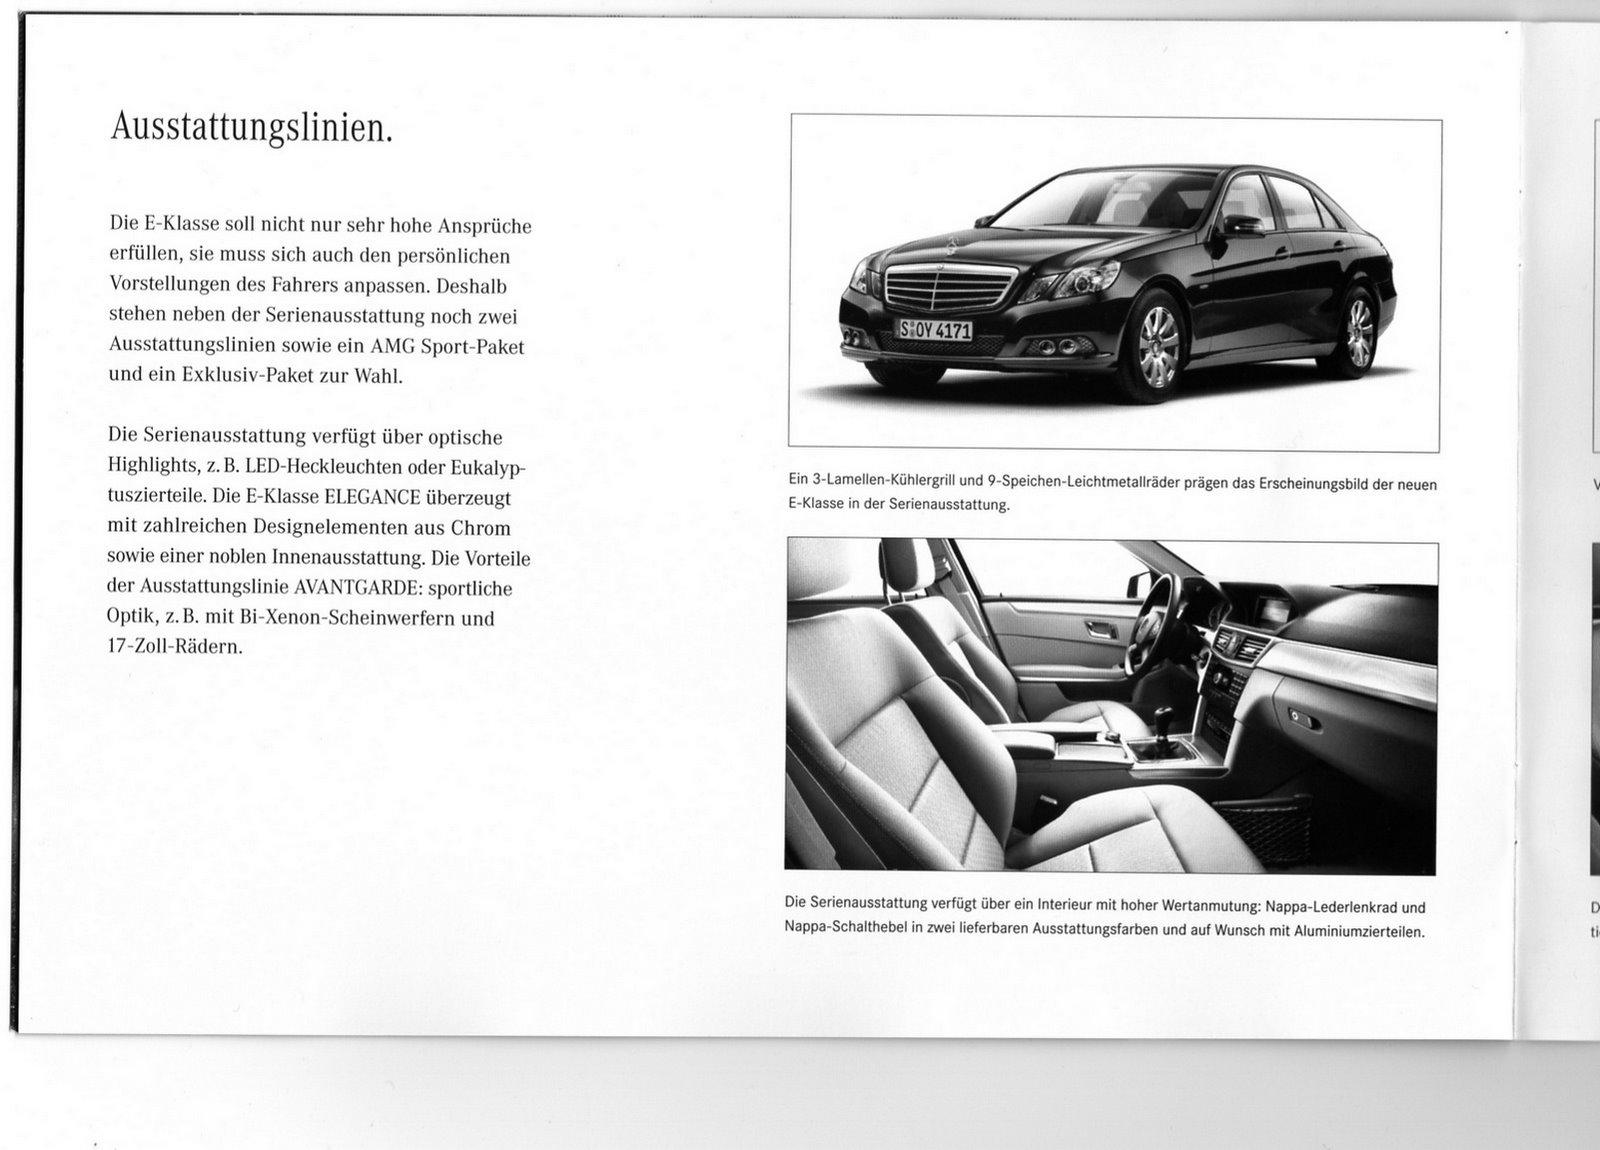 New mercedes benz e klasse w212 german brochure leak for Mercedes benz e class brochure